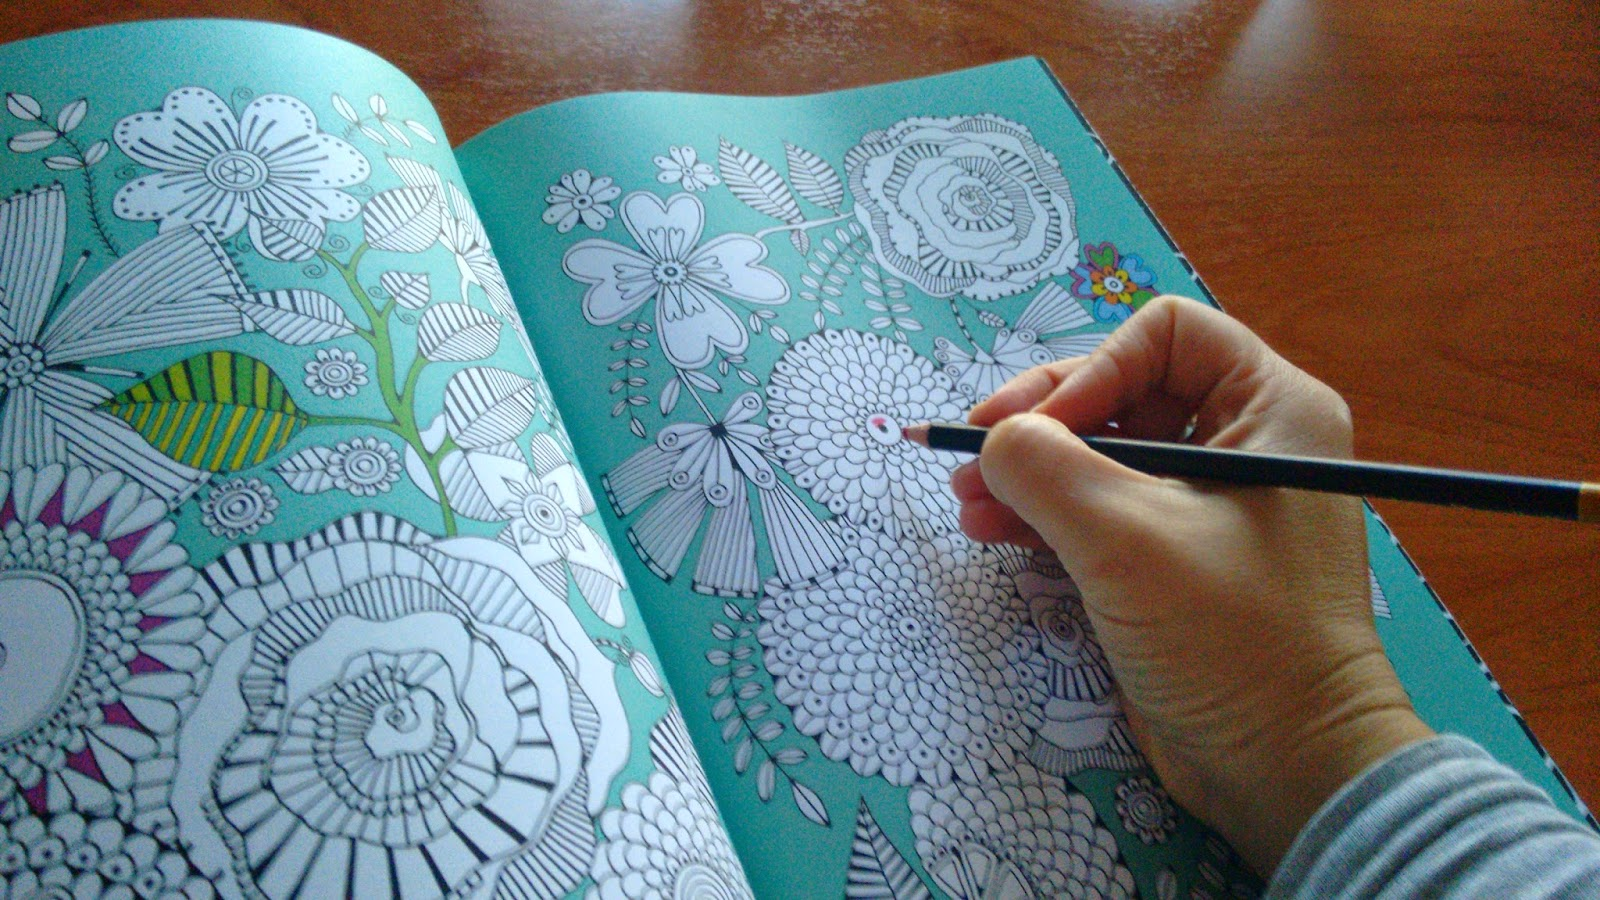 Libros para colorear como terapia antiestrés para adultos | LectorMx